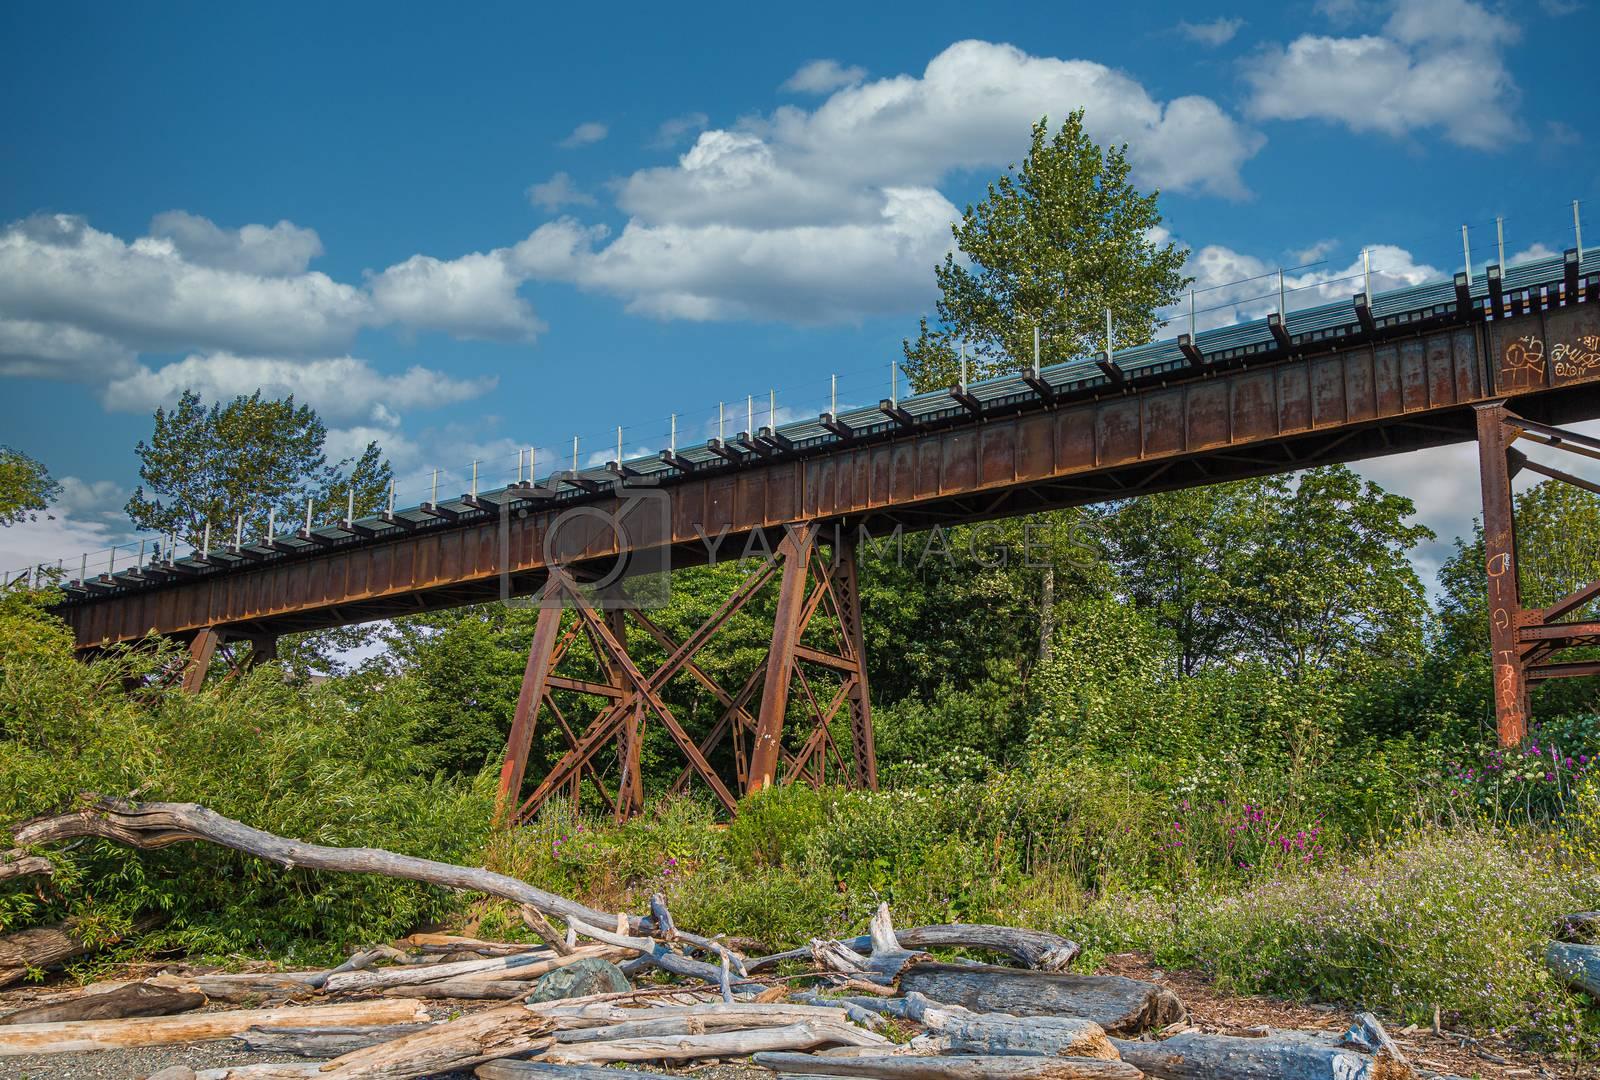 Old Rusty Trestle Bridge on the Coast of Washington, State